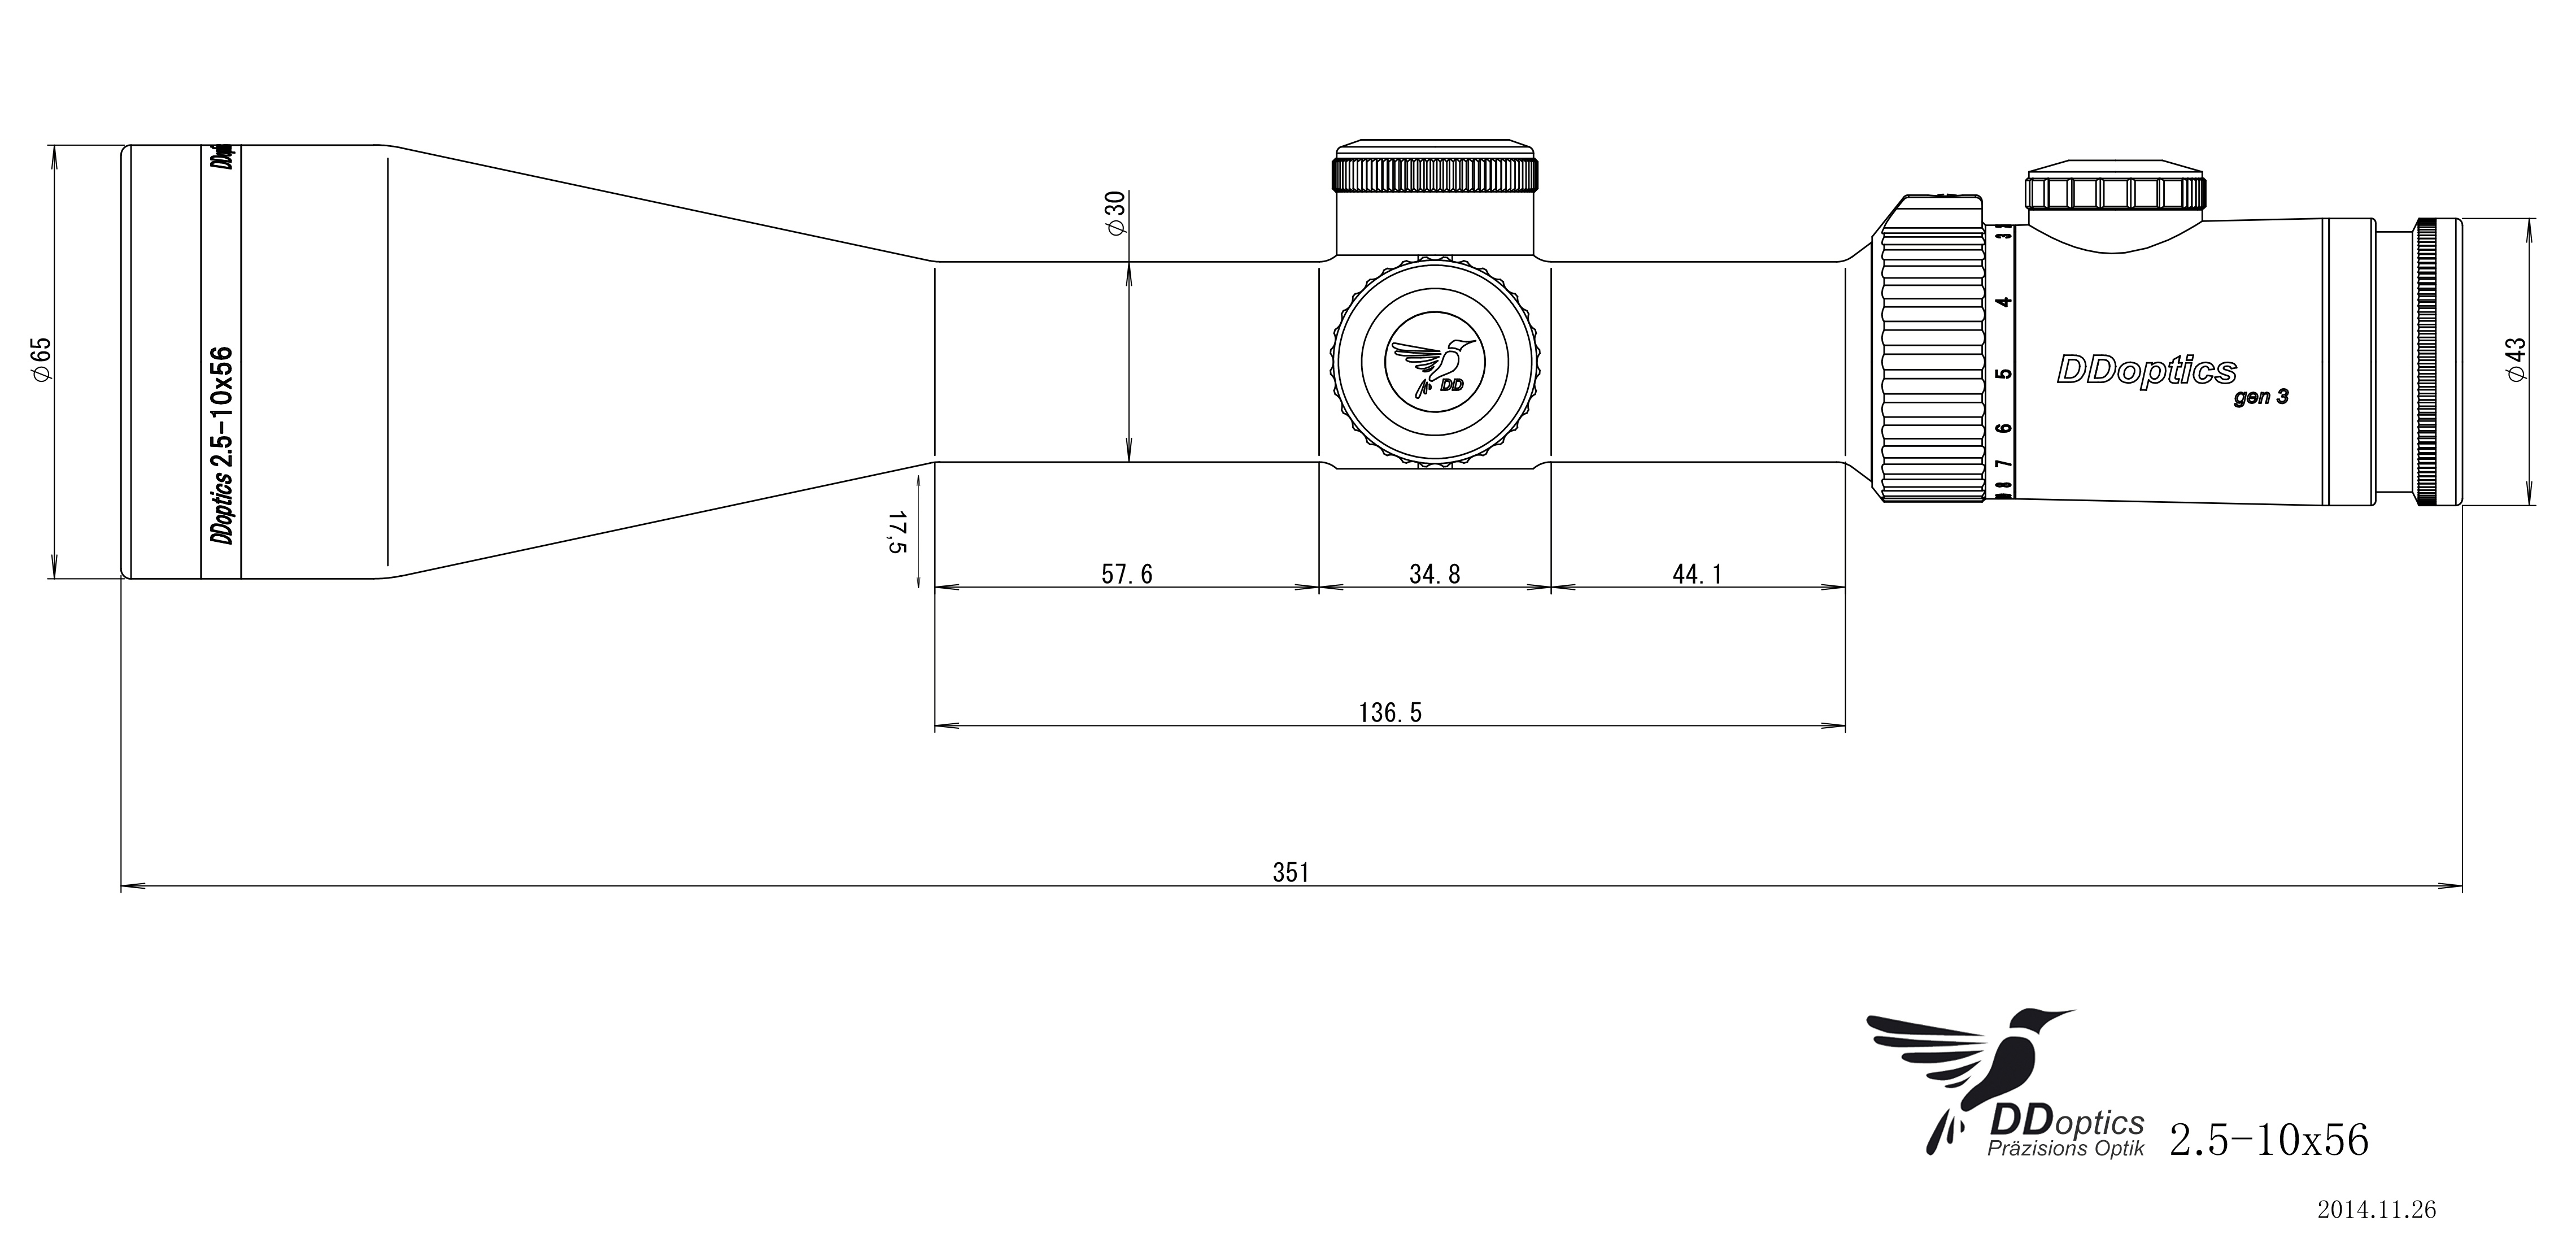 DDoptics Zielfernrohr 2,5-10x56